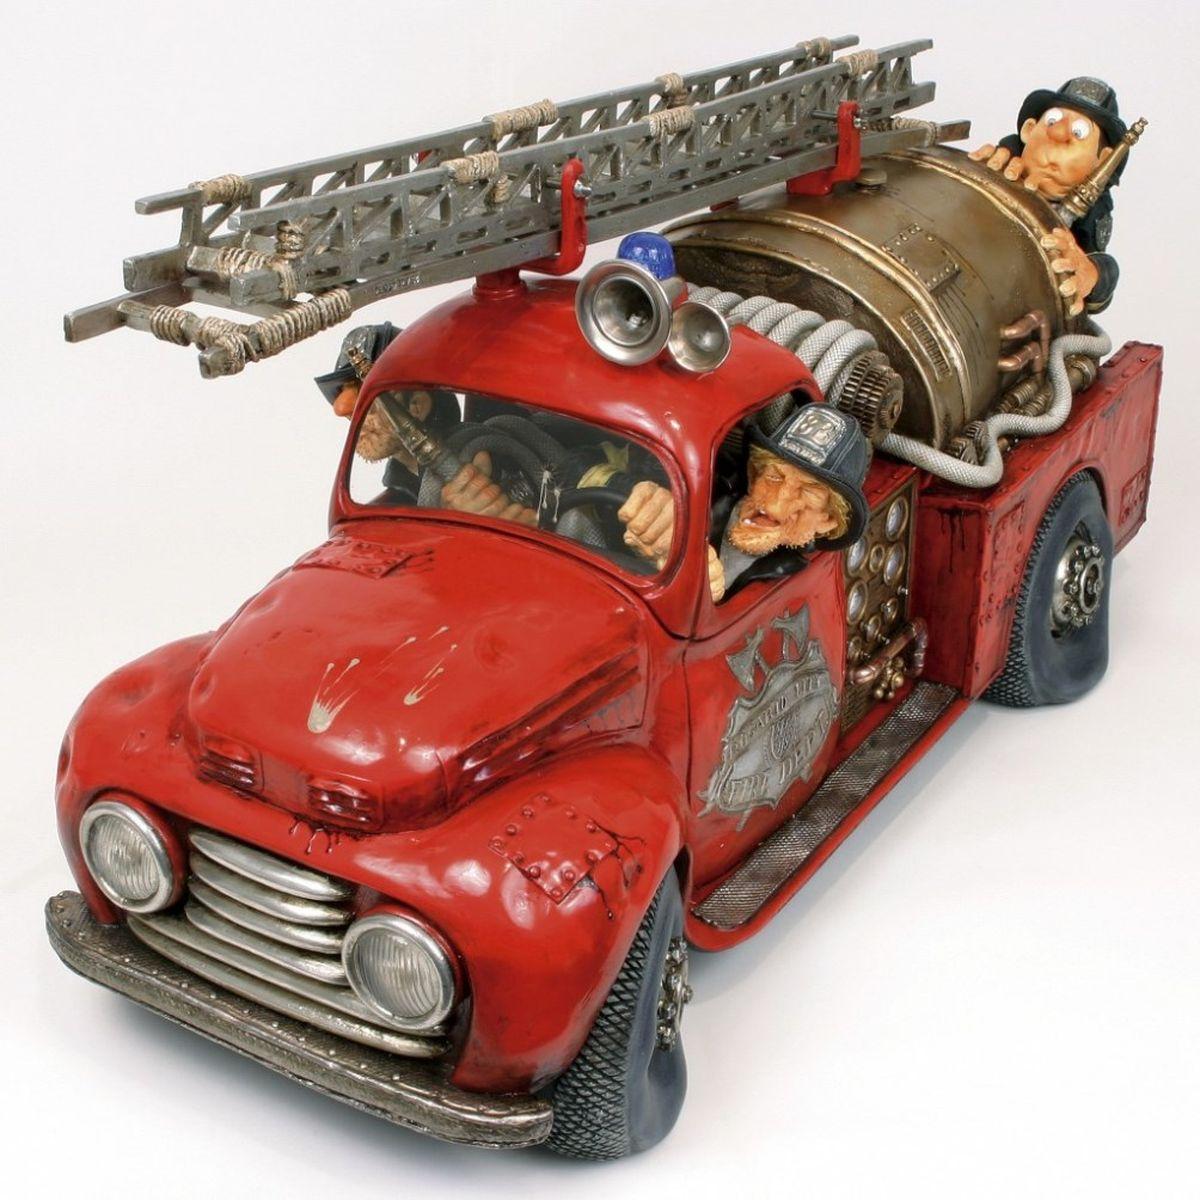 Статуэтка Gillermo Forchino Пожарная Машина 50% статуэтки forchino статуэтка shelby cobra 427 s c